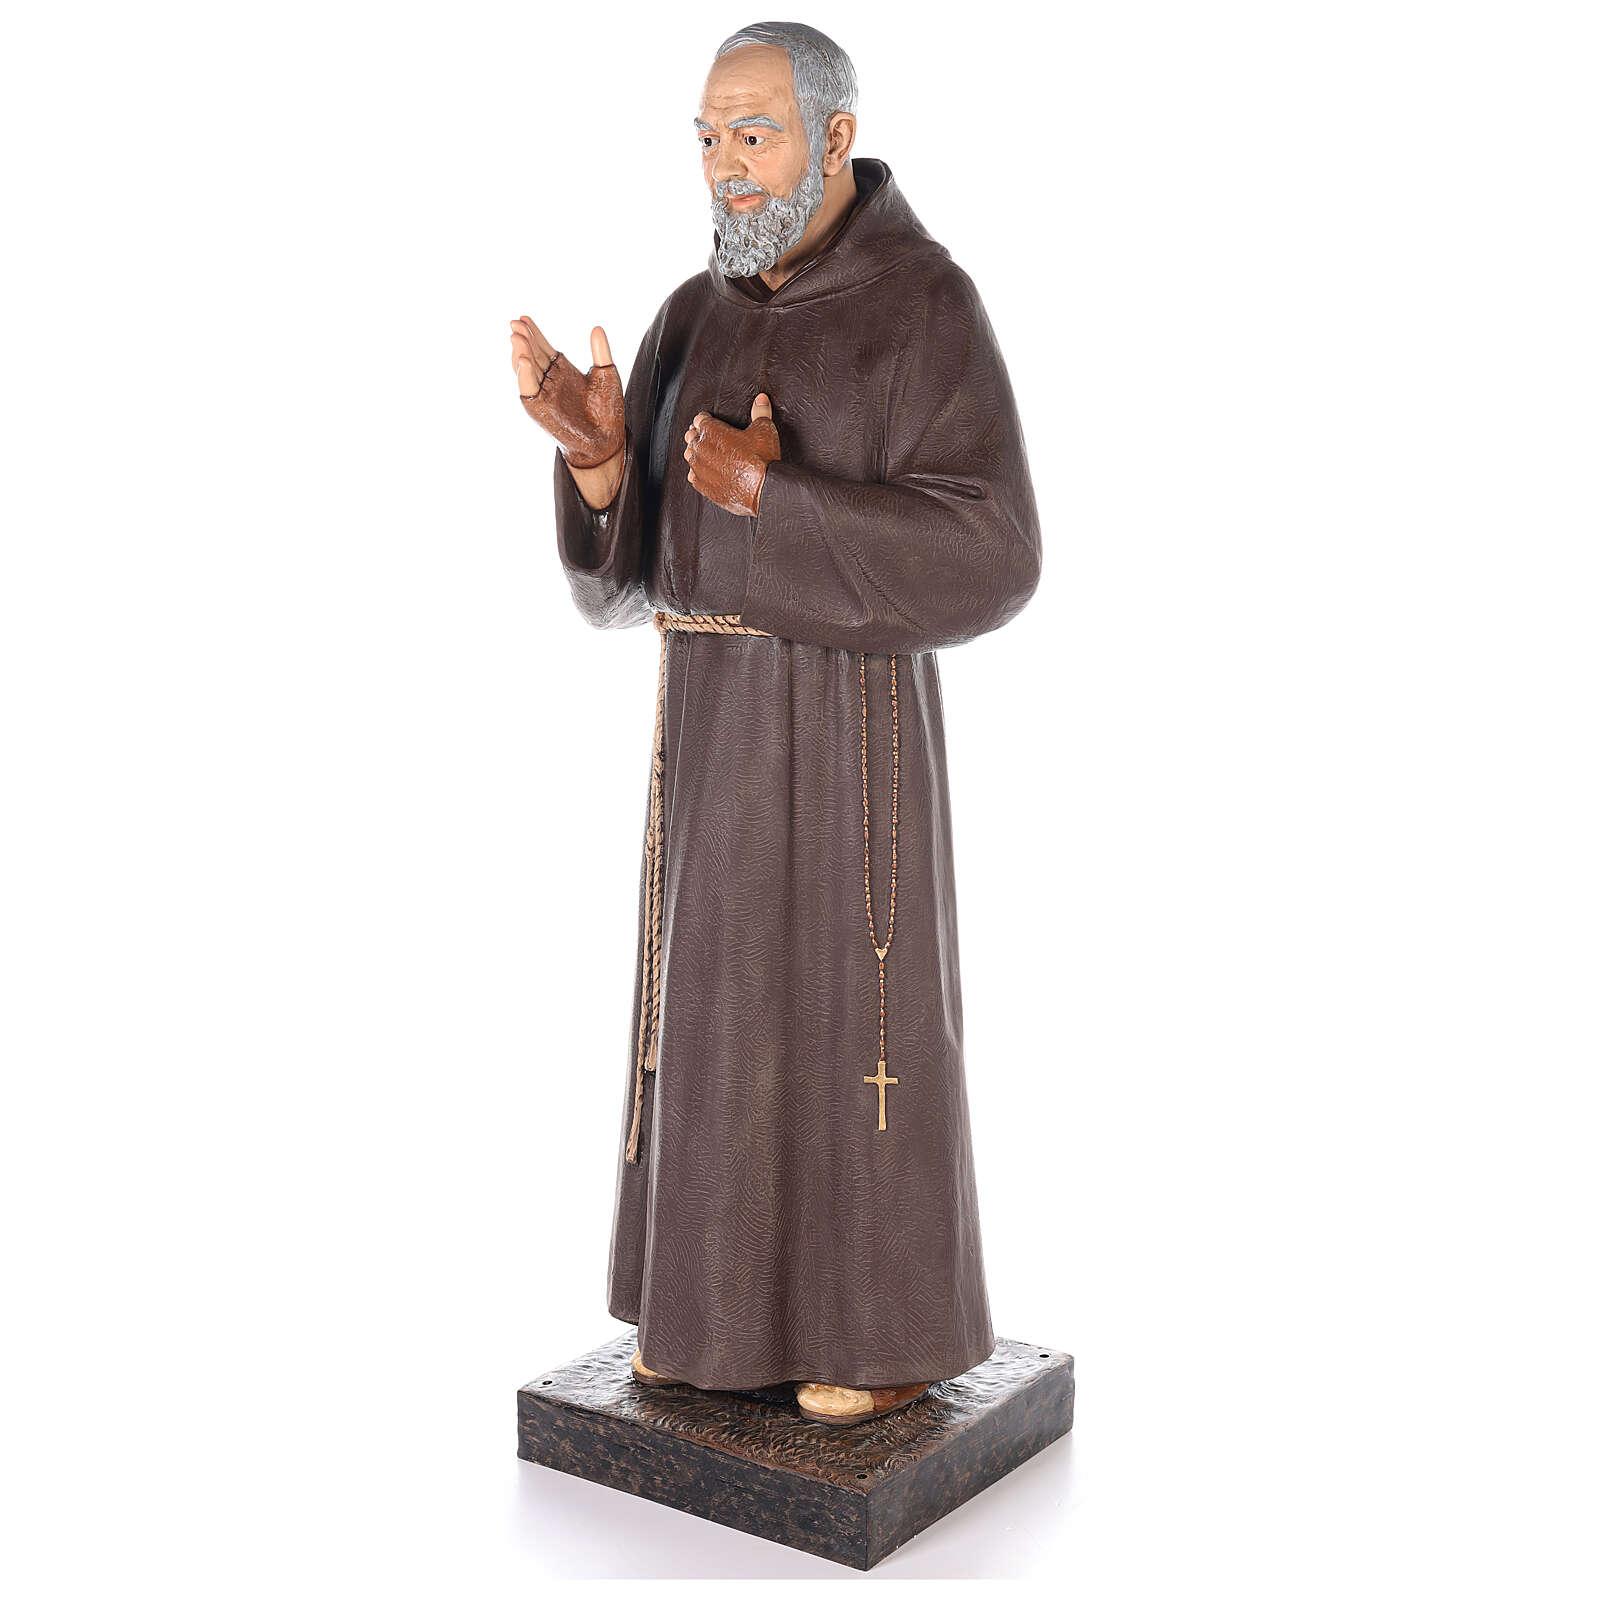 San Pio statua vetroresina colorata 180 cm occhi vetro 4